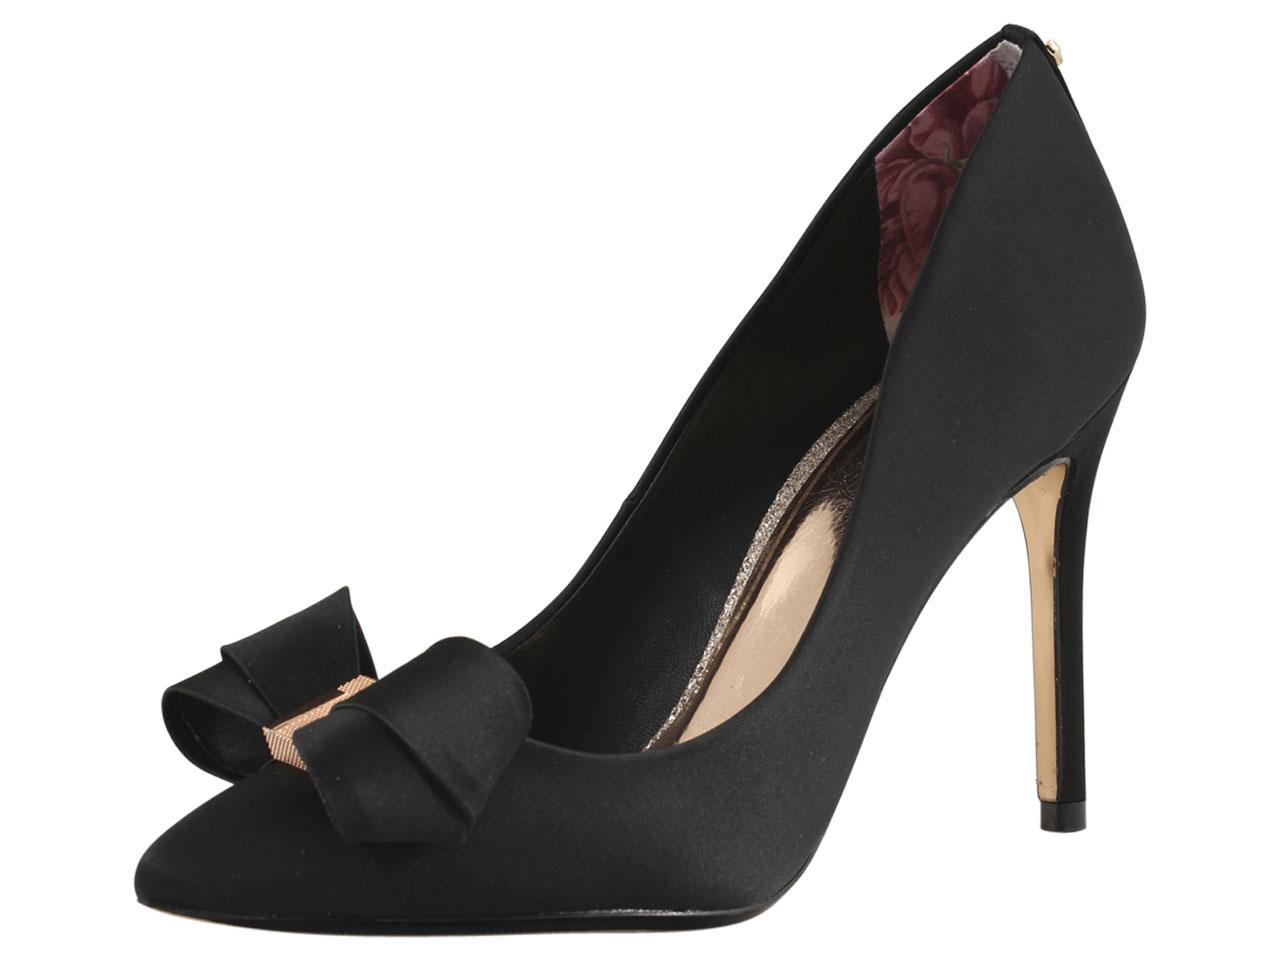 03905df78b9591 Ted Baker Women s Skalett Pumps Heels Shoes